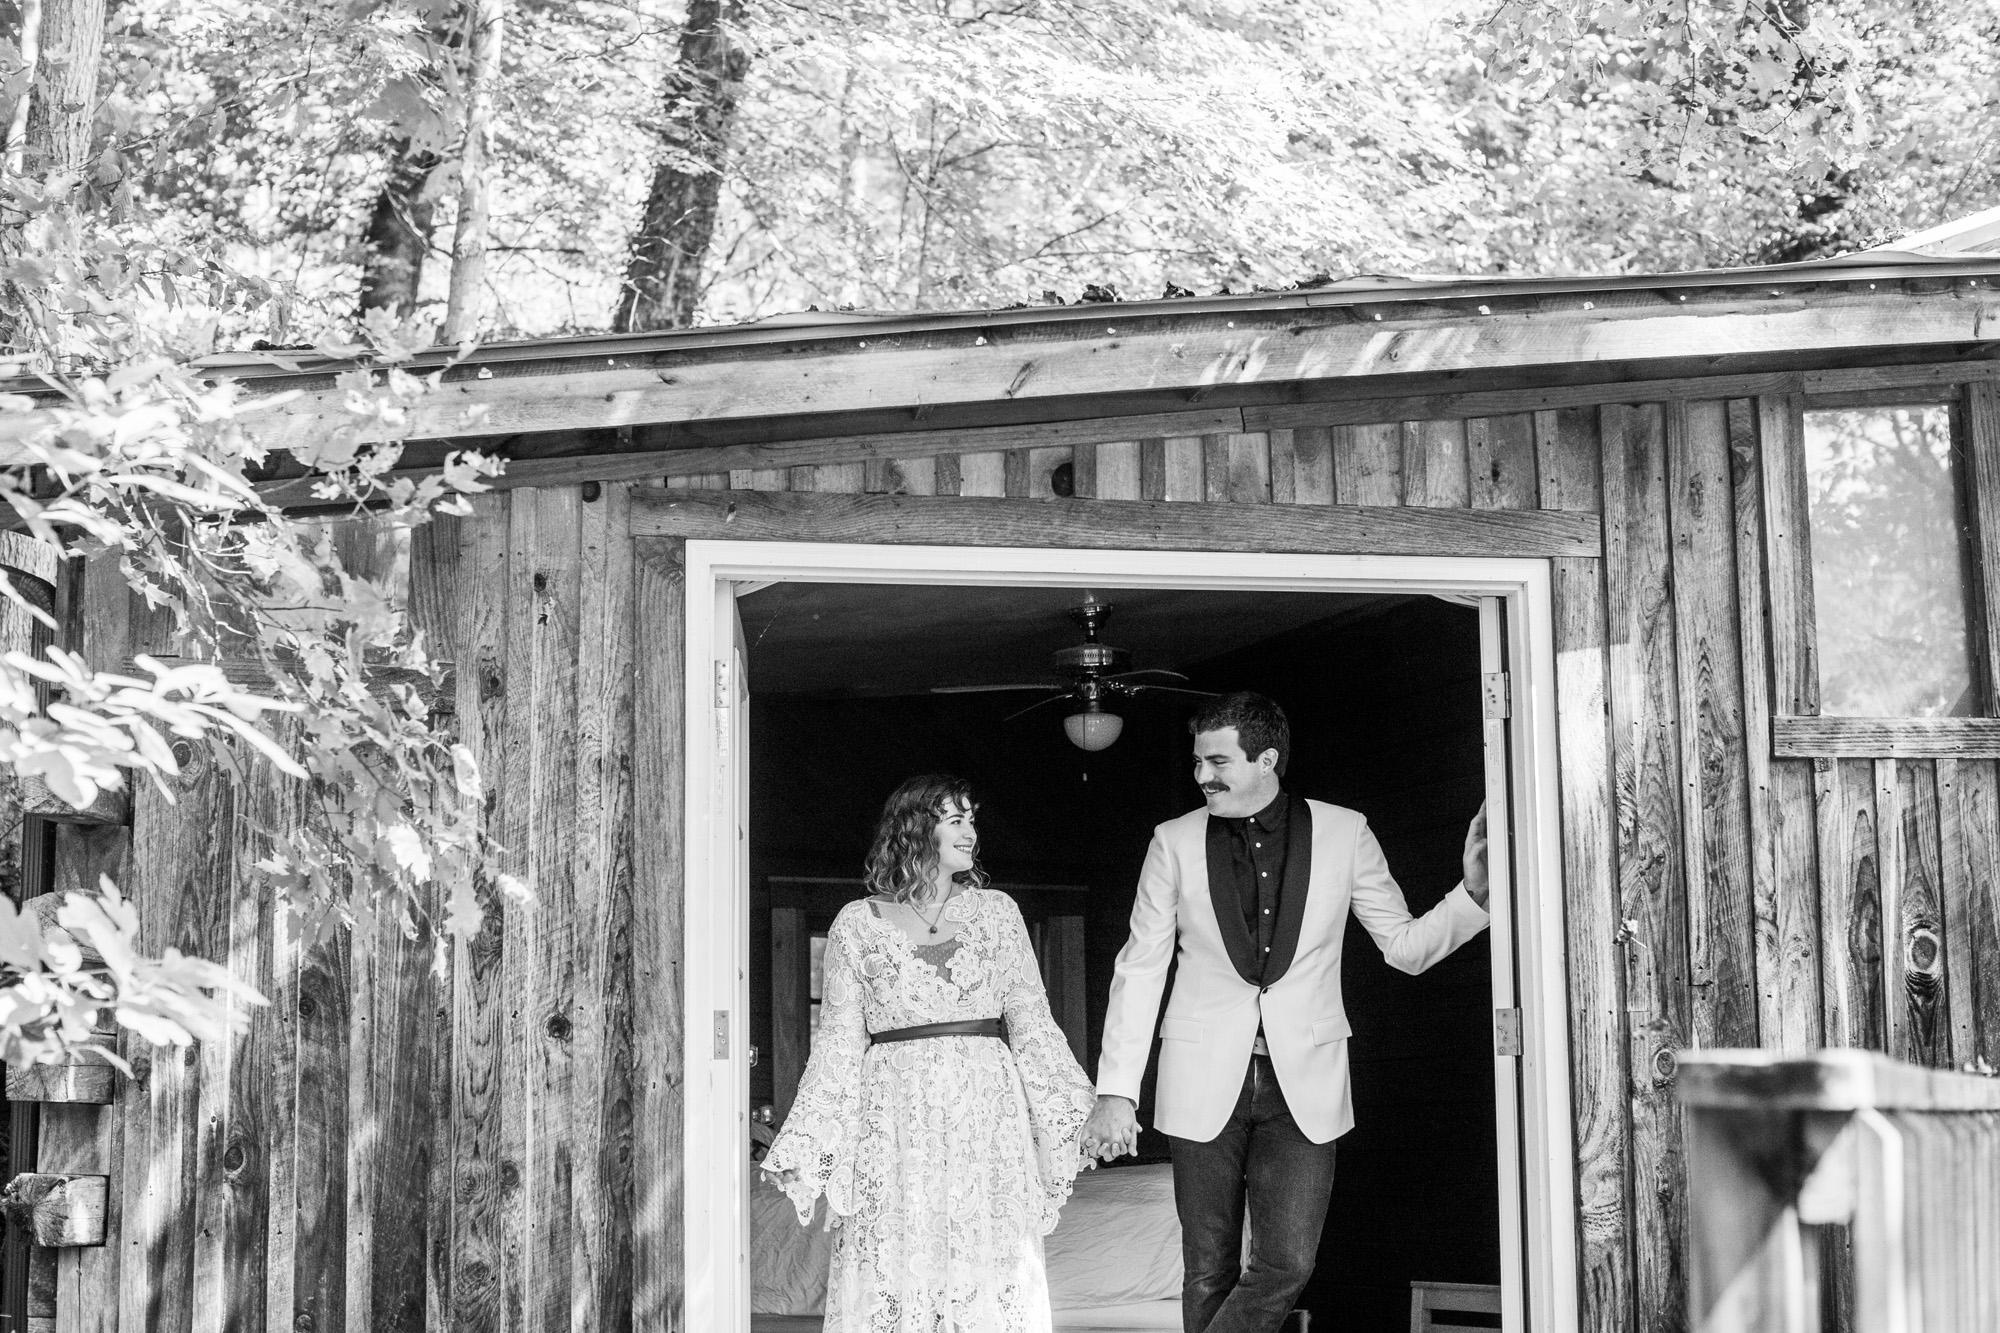 Seriously_Sabrina_Photography_Red_River_Gorge_Kentucky_Wedding_ShawnDana52.jpg